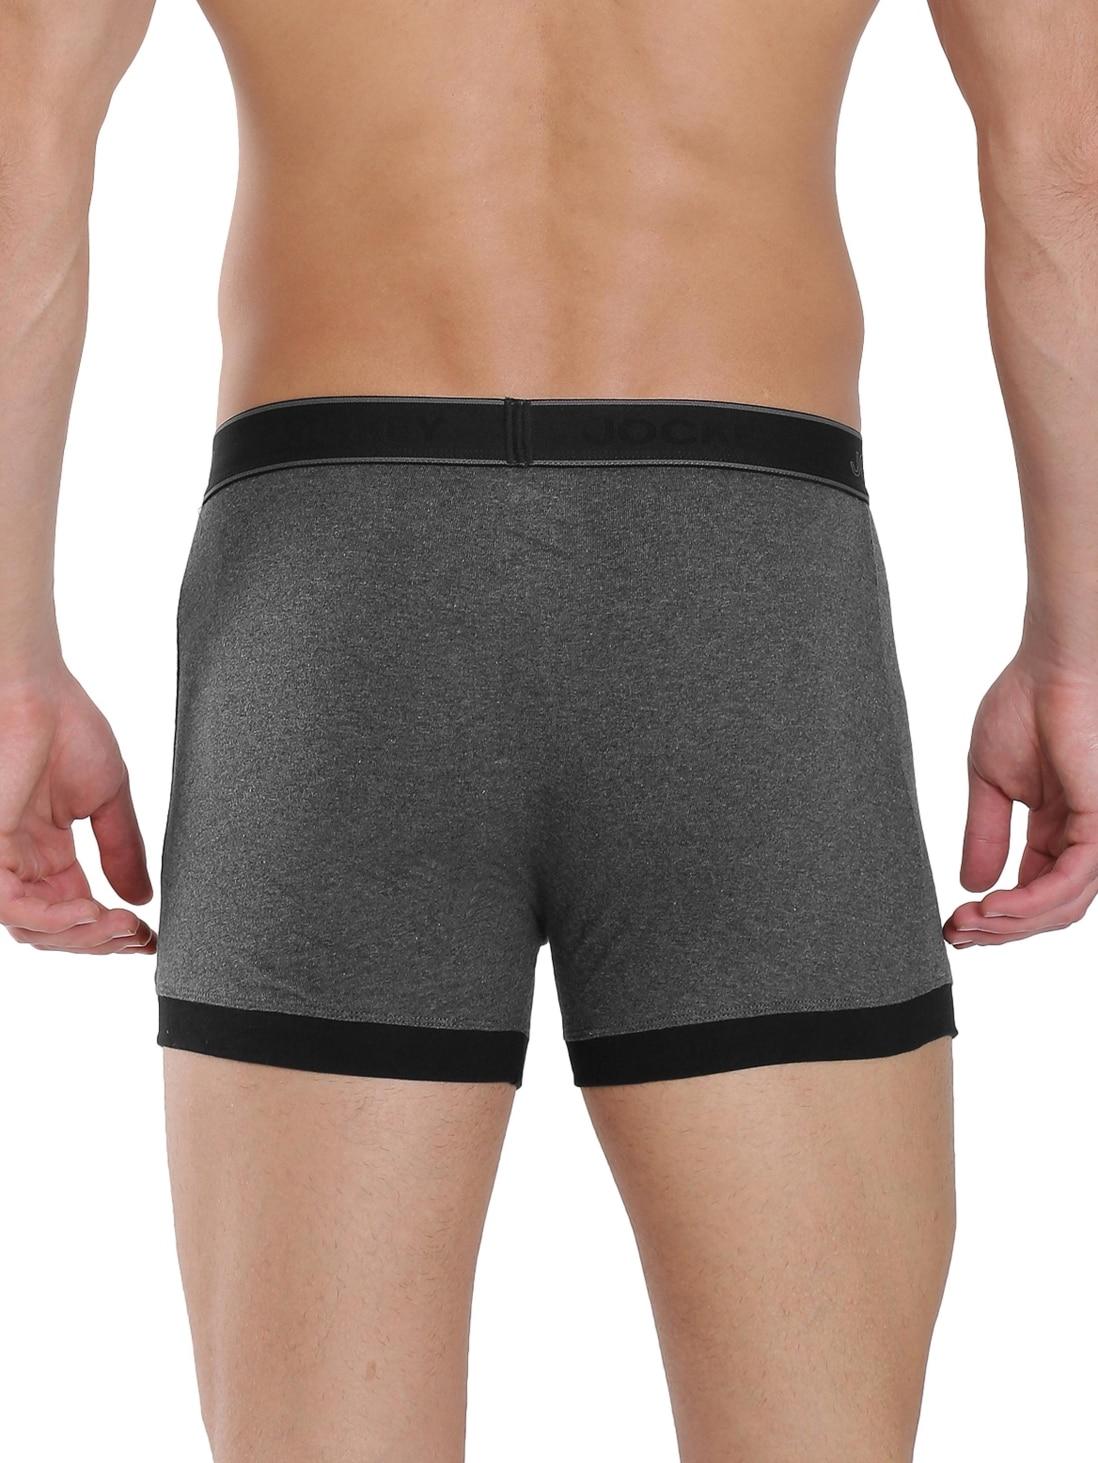 Jockey Men's Charcoal Melange Fashion Trunk (L,Charcoal Melange)